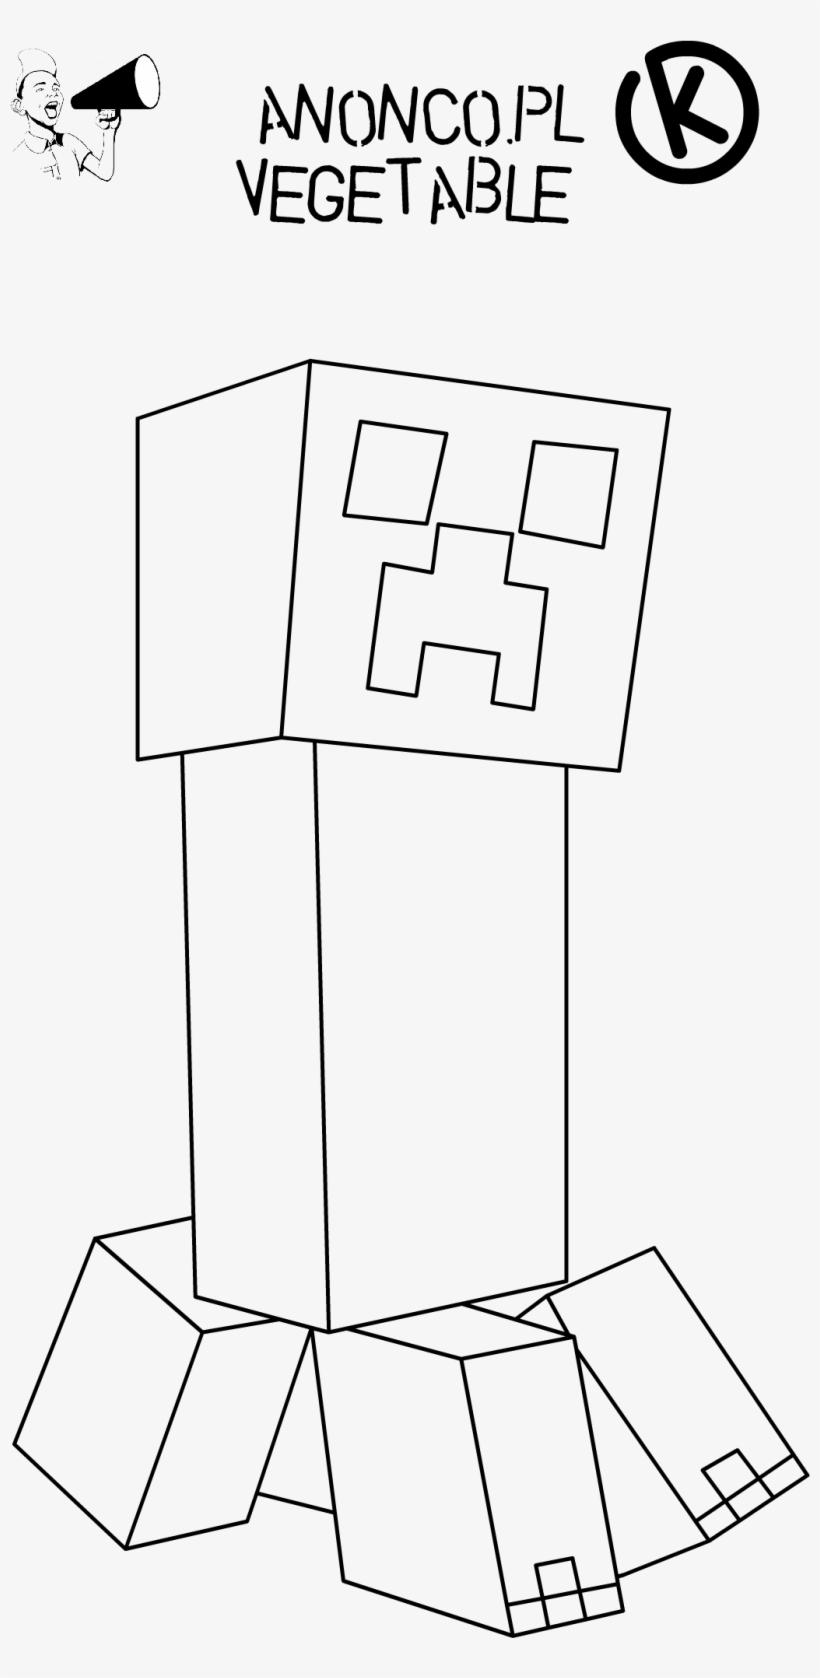 Minecraft Popularmmos Coloring Pages Photo Minecraft Kolorowanki Do Druku Transparent Png 1654x2339 Free Download On Nicepng